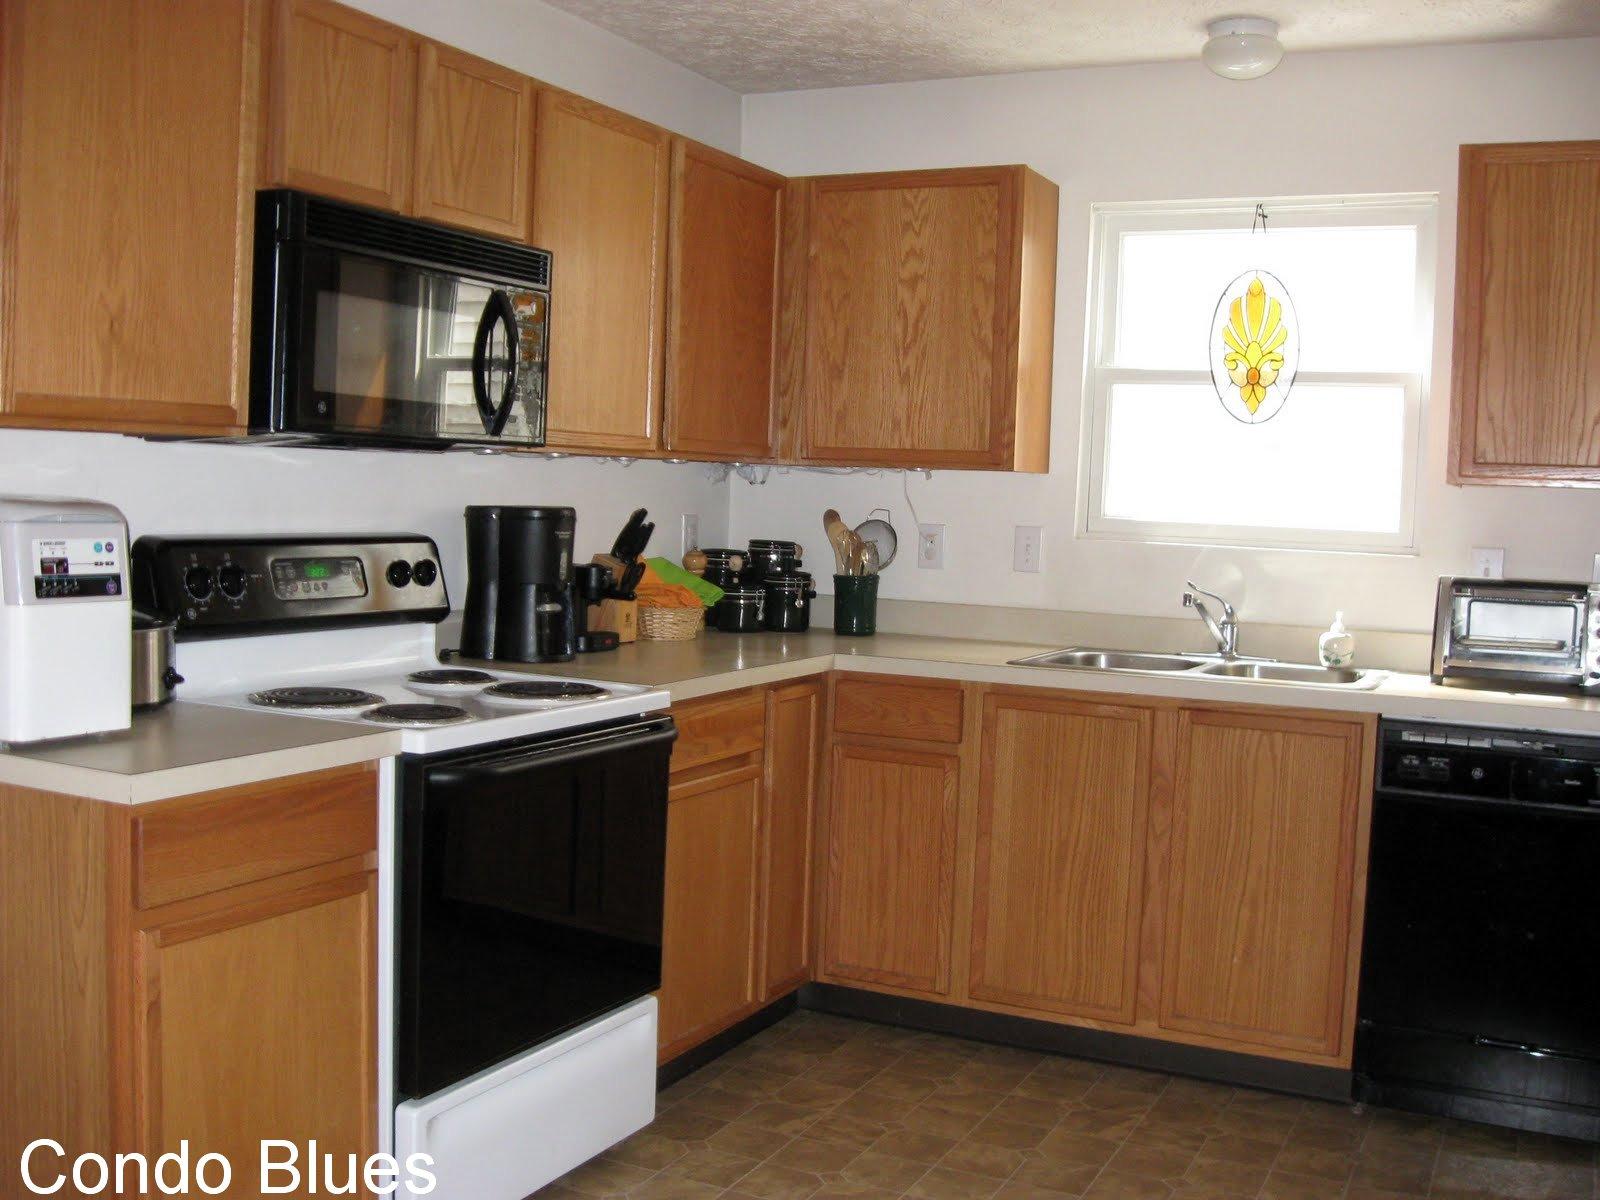 Condo Blues I Dream of New Kitchens